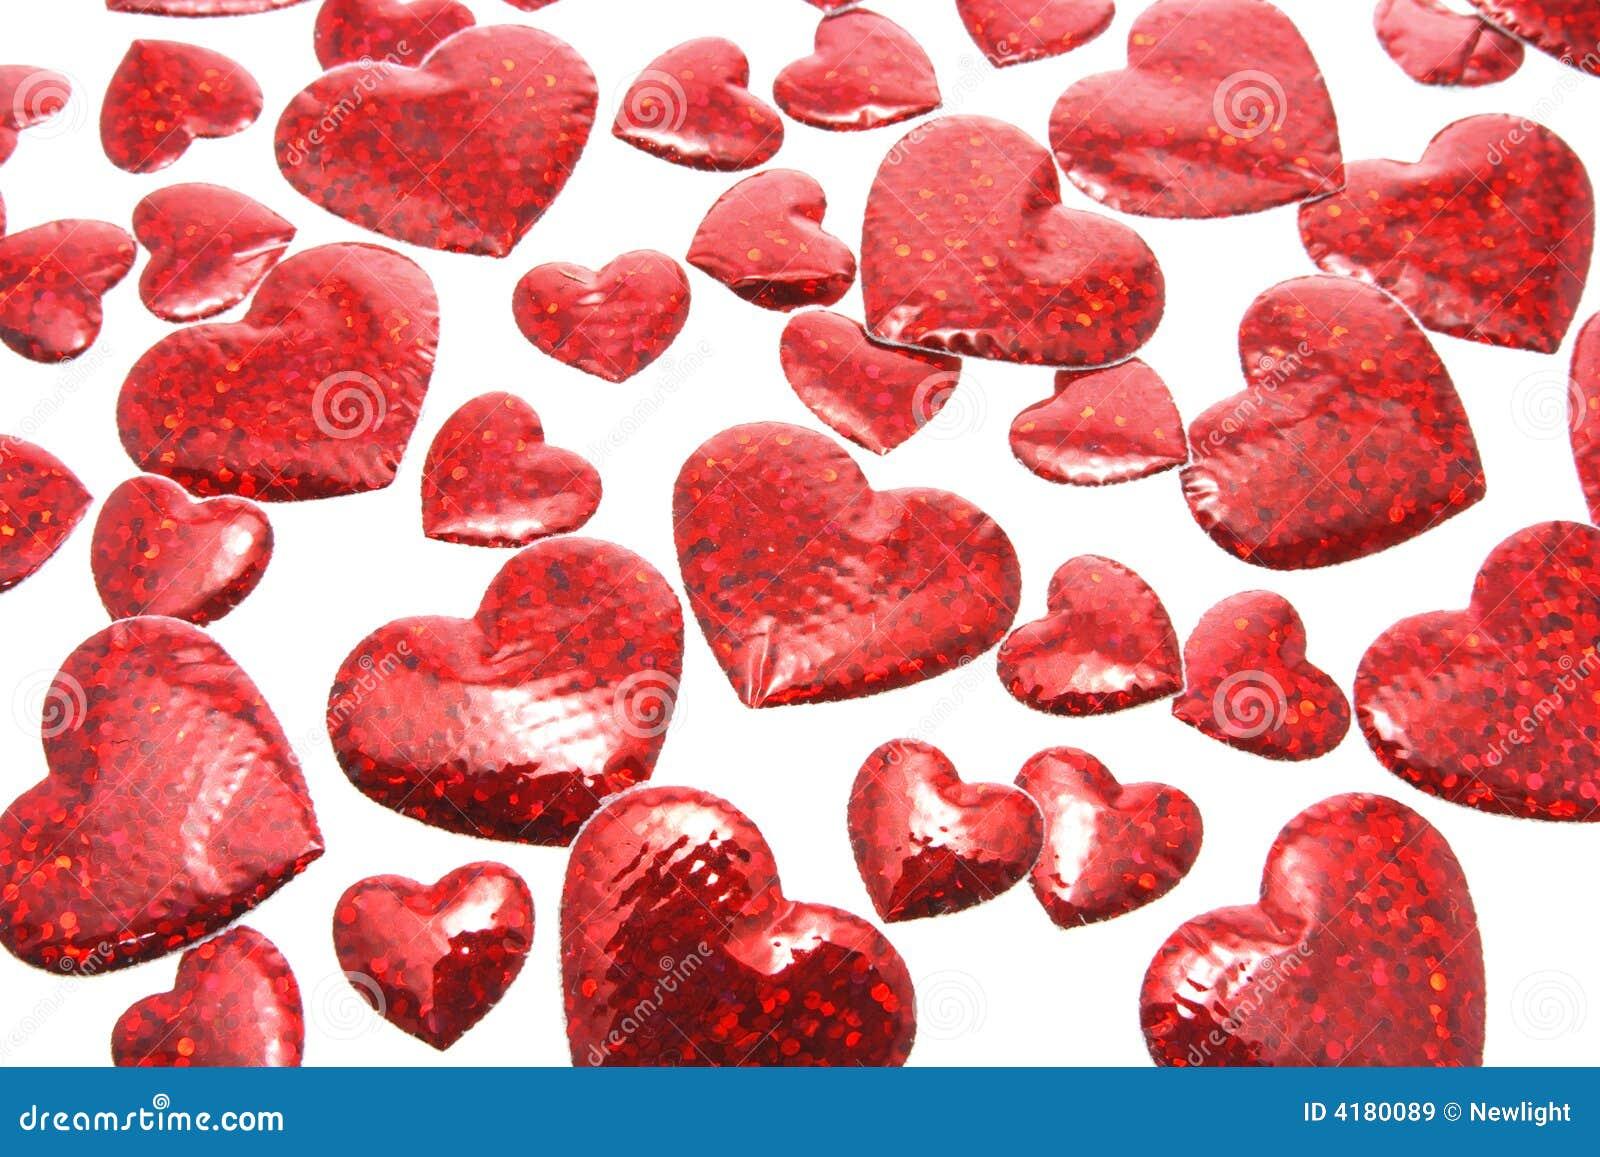 Love heart symbols stock image image of hearts concept 4180089 love heart symbols buycottarizona Gallery